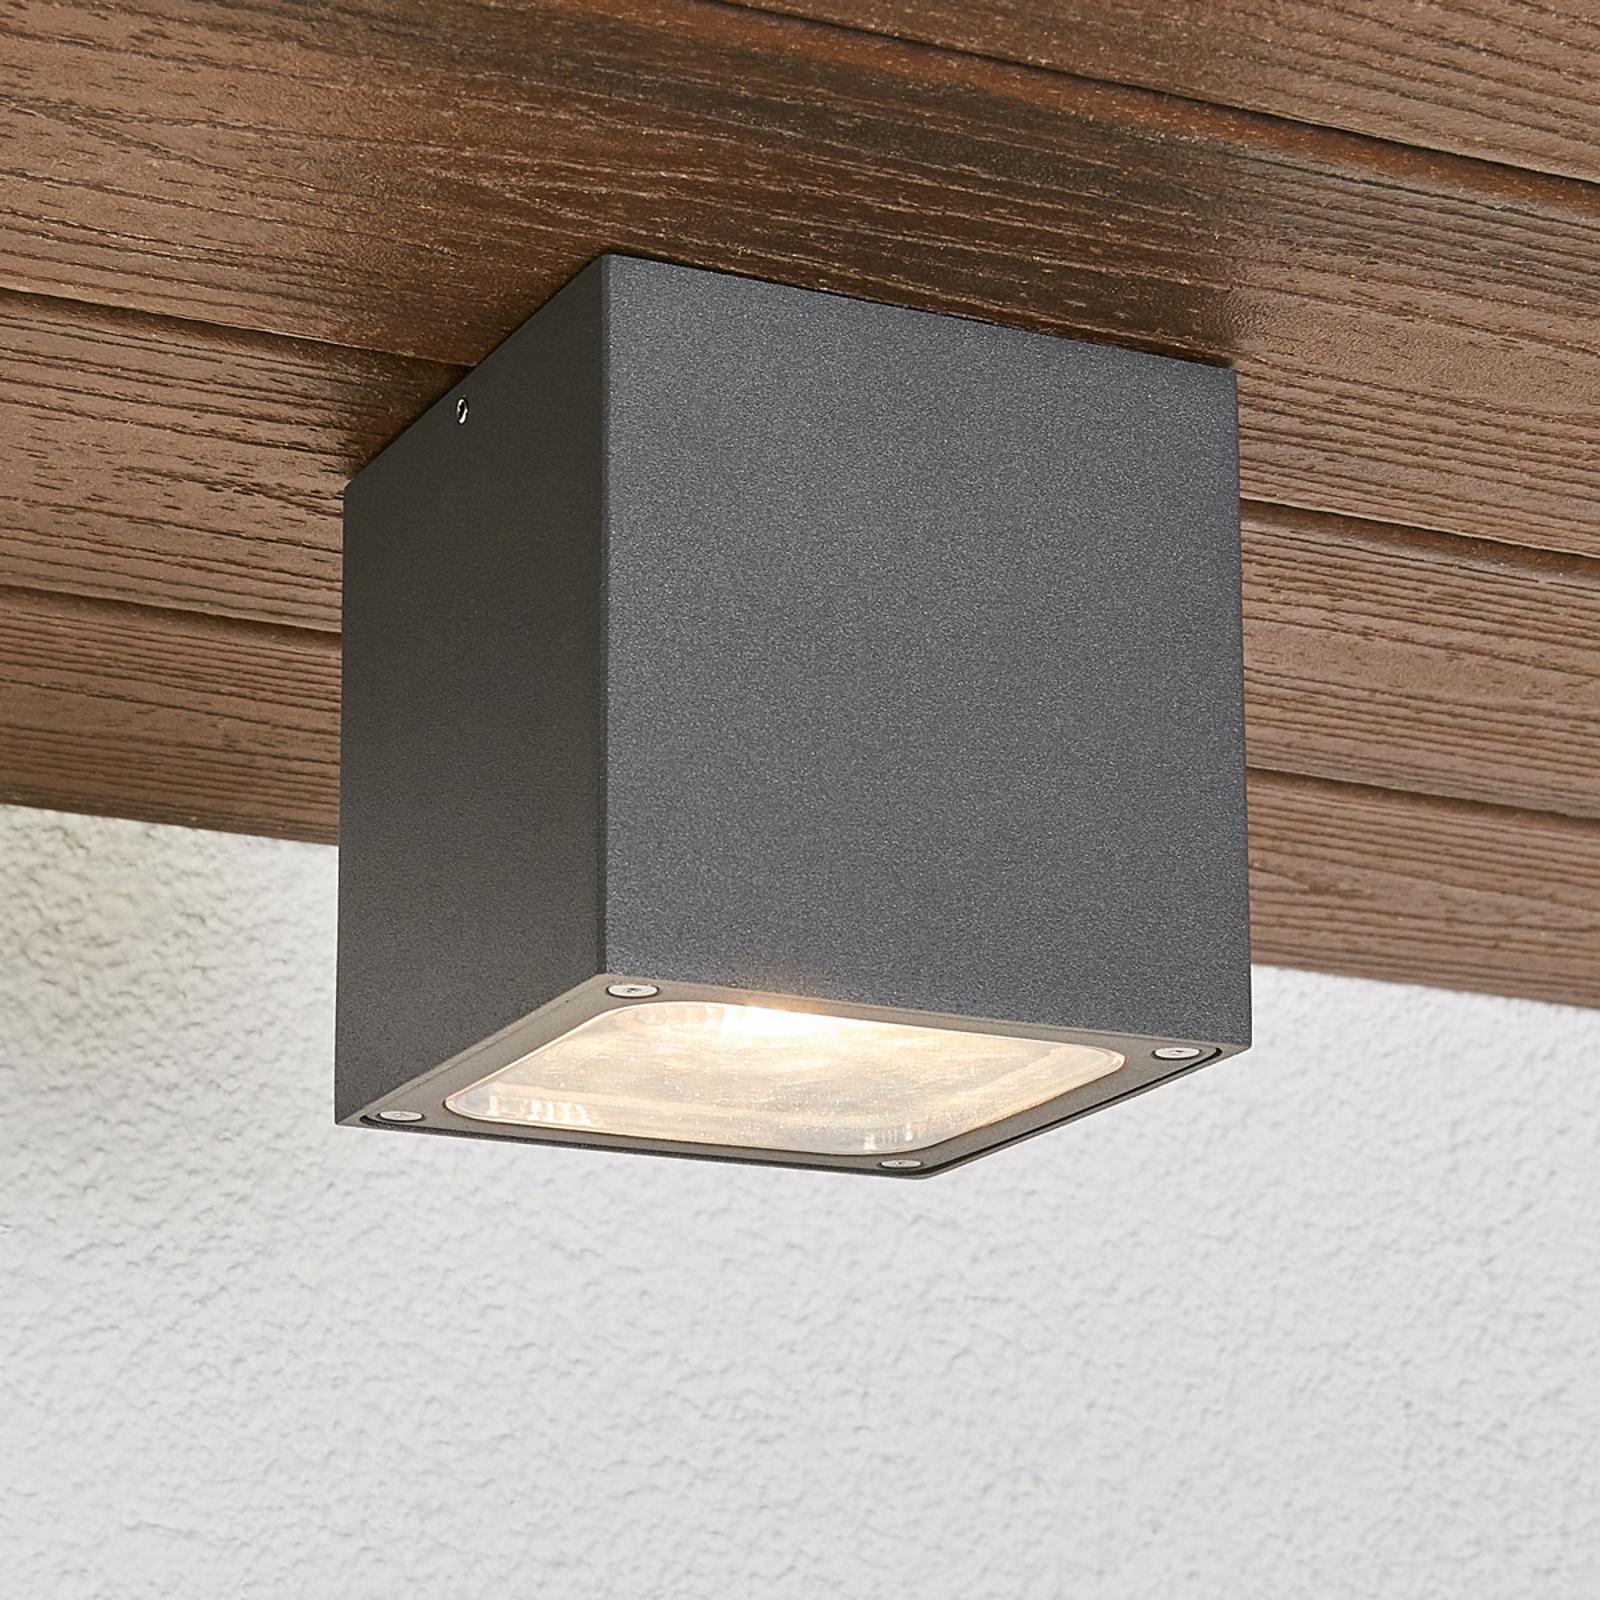 Tanea - LED-Deckenleuchte in Würfelform, IP54